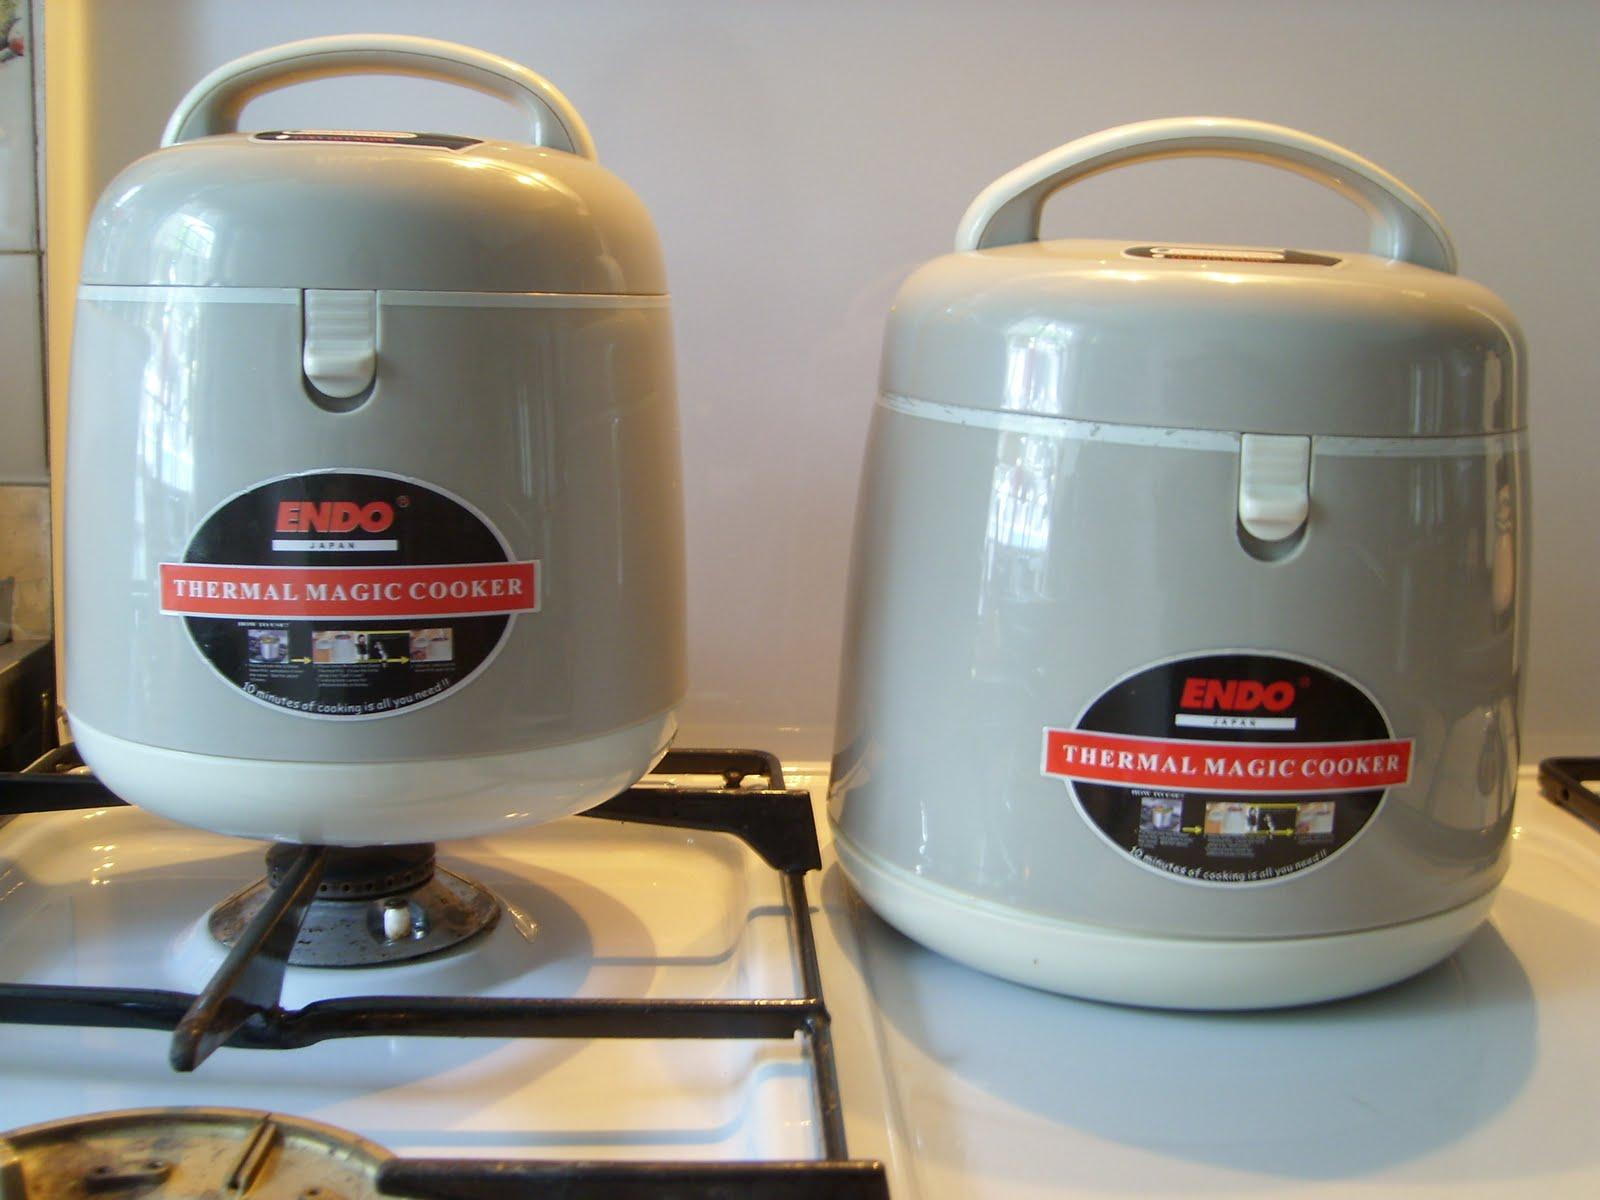 Endo thermal magic cooker malaysia price